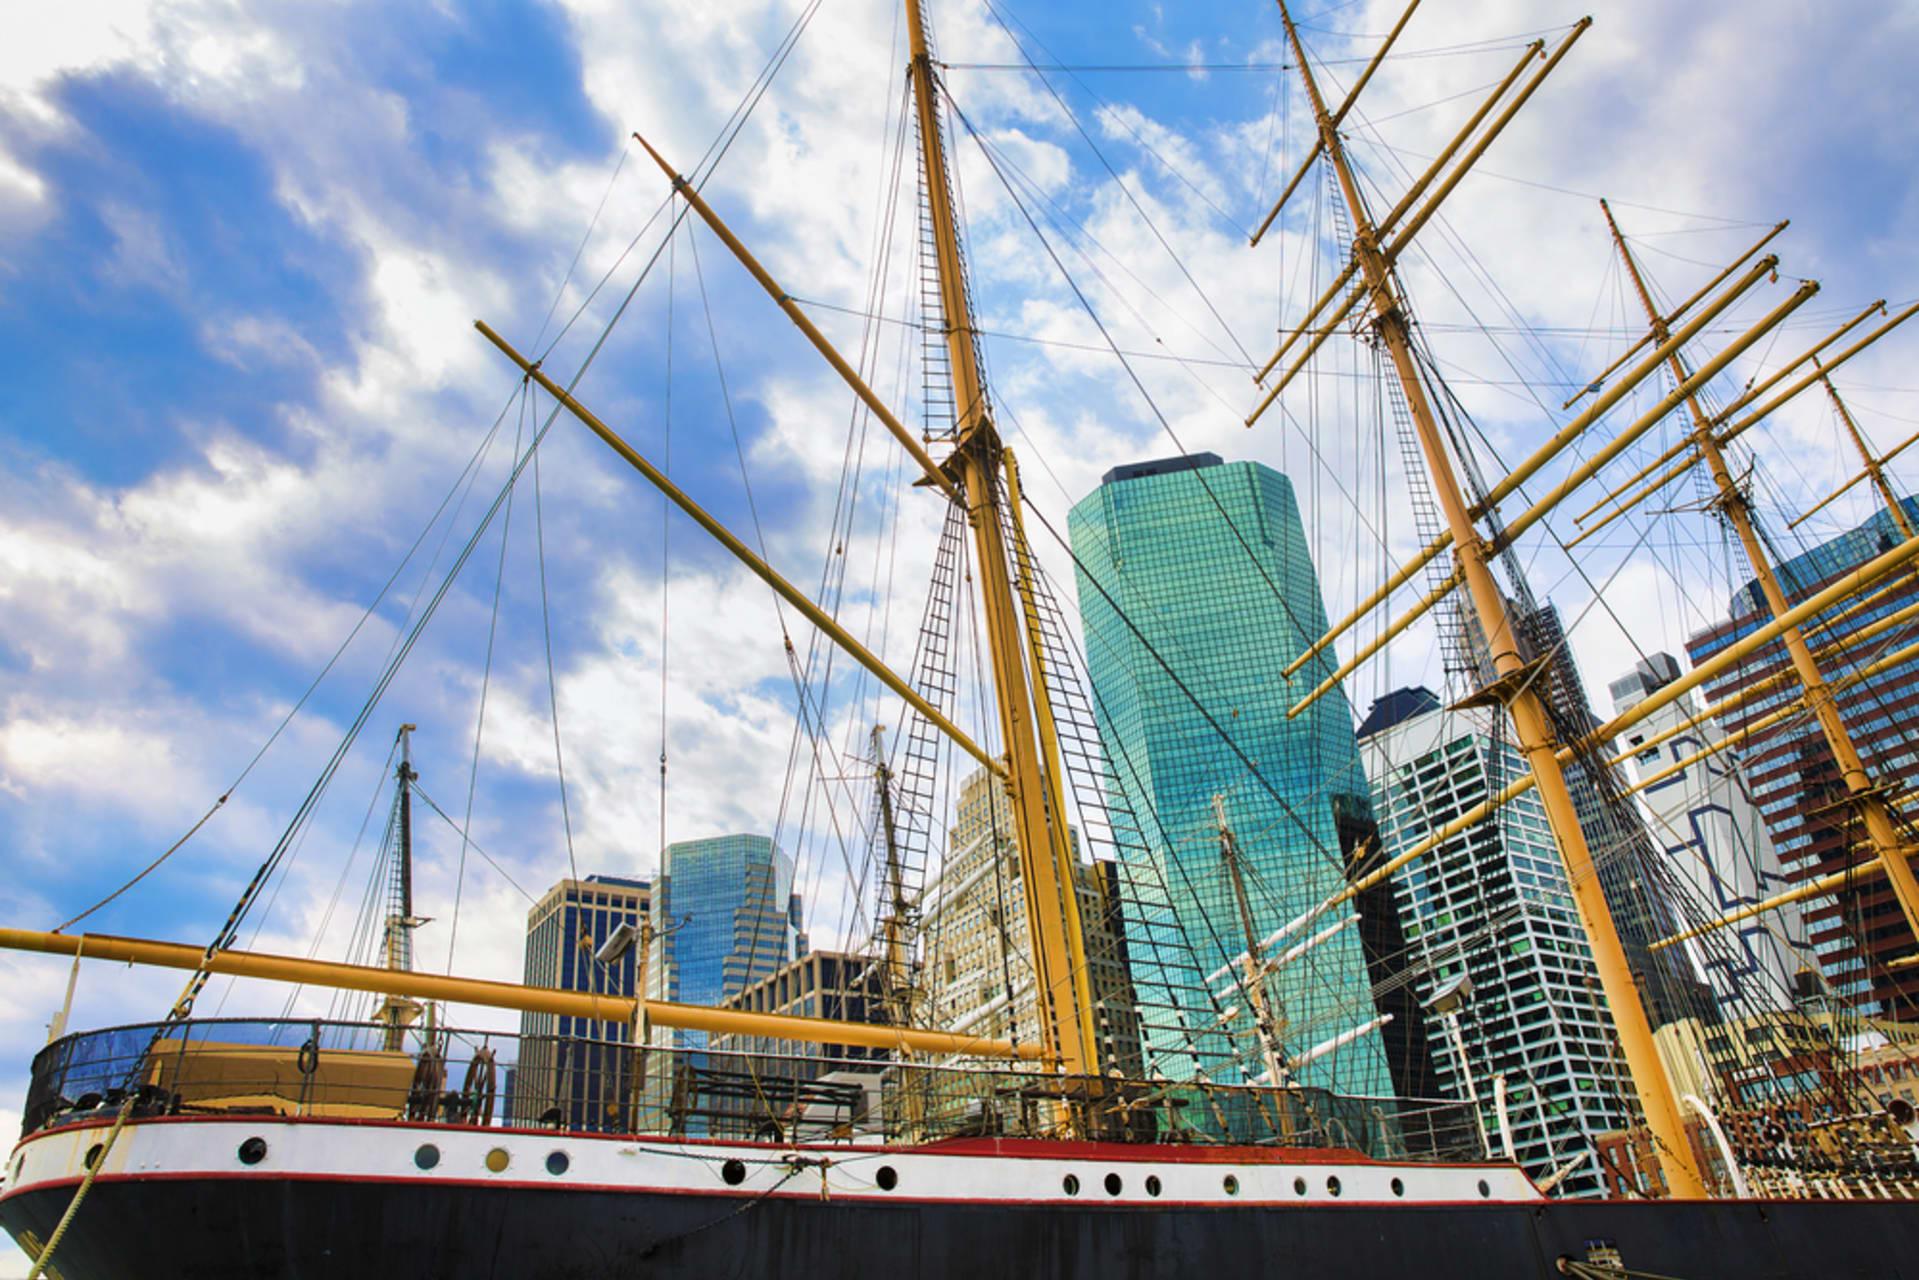 New York - South Street Seaport